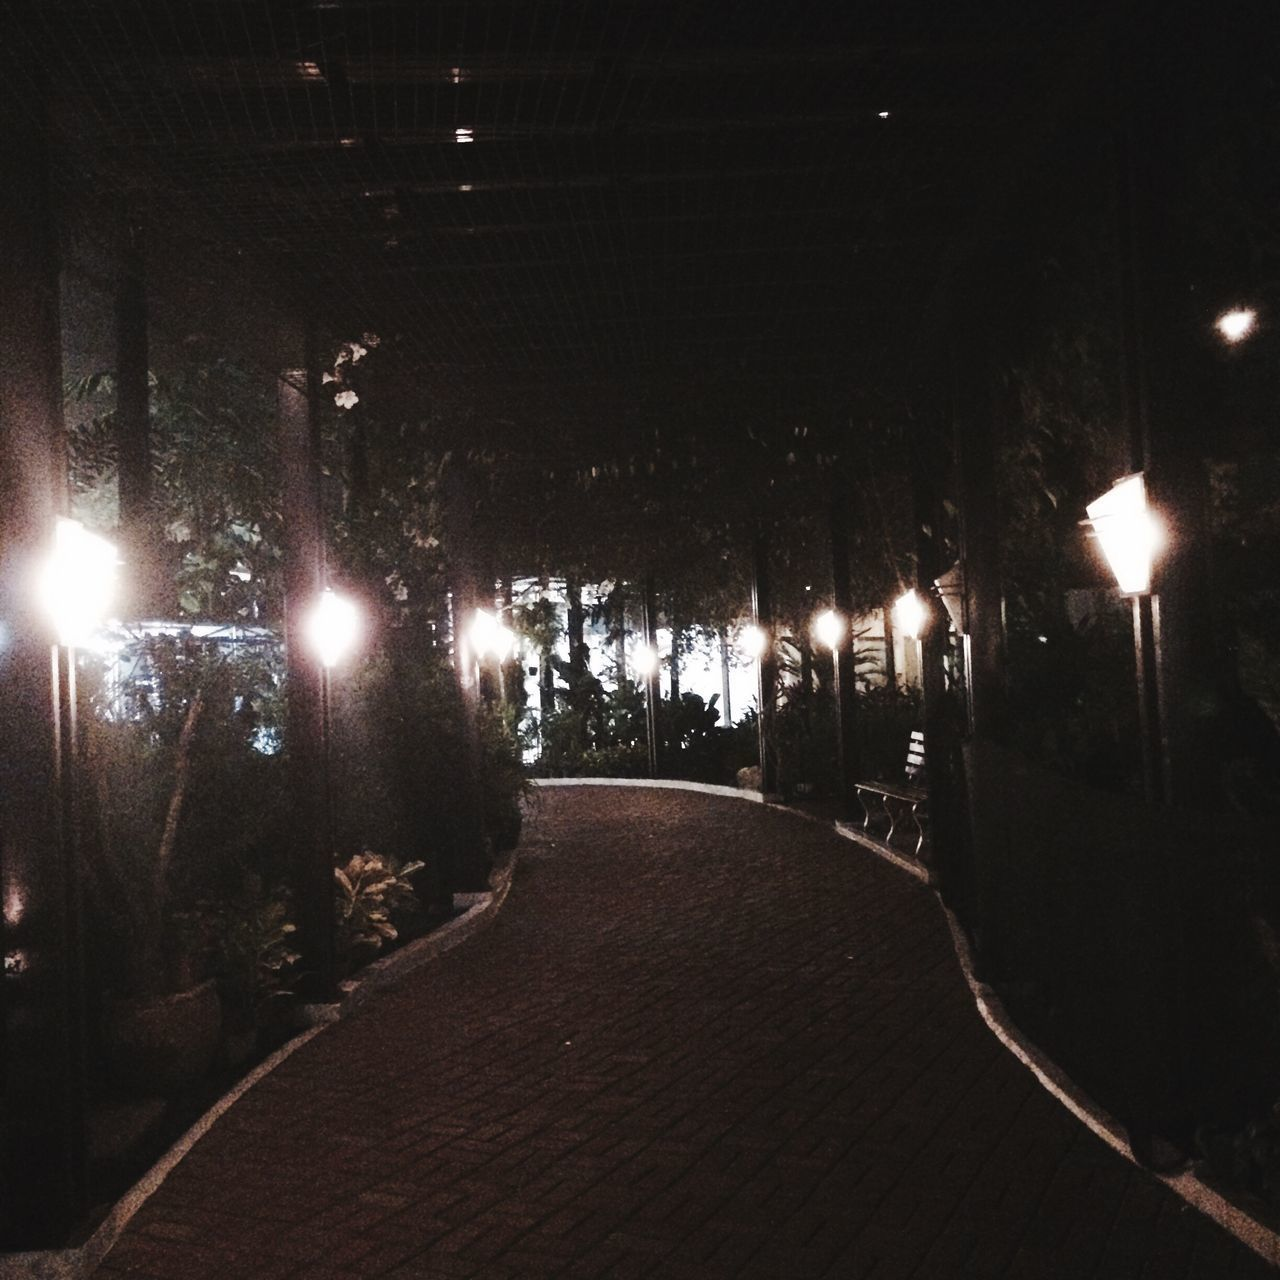 Illuminated Lighting Equipment Night Road No People Indoors